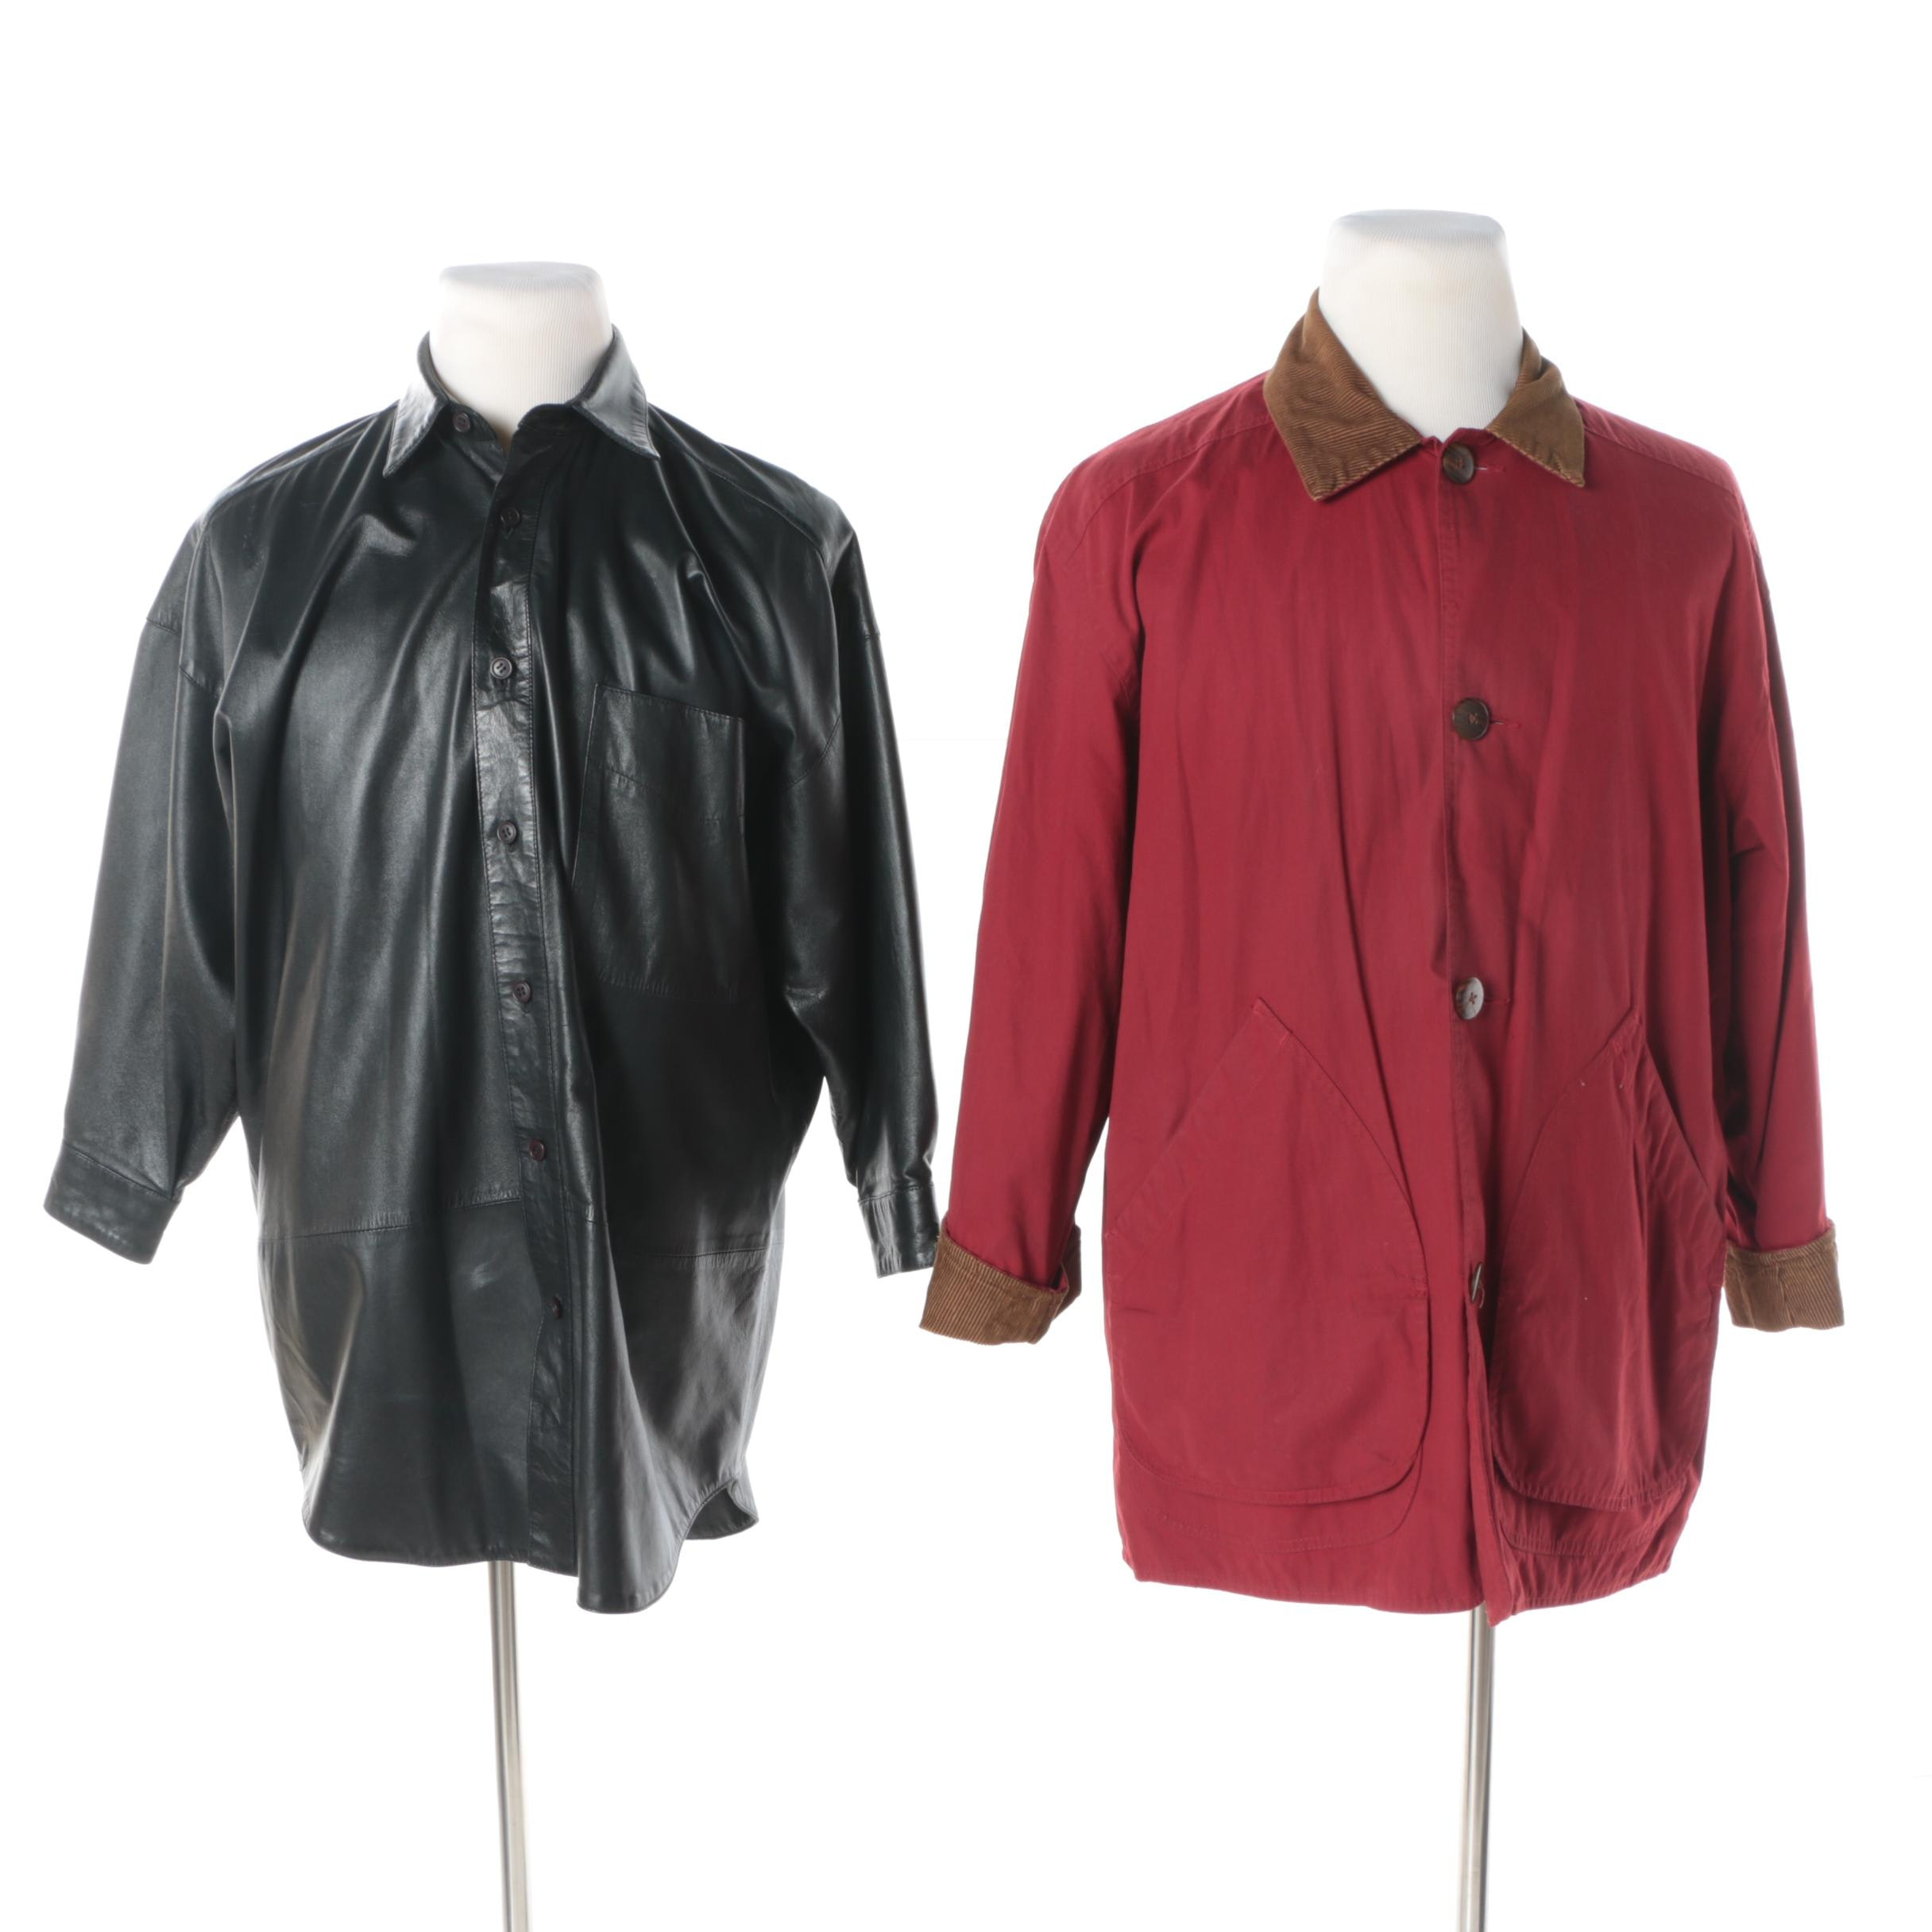 Men's Vintage Go Silk for L'Zinger Leather Jacket and J.Crew Red Cotton Jacket